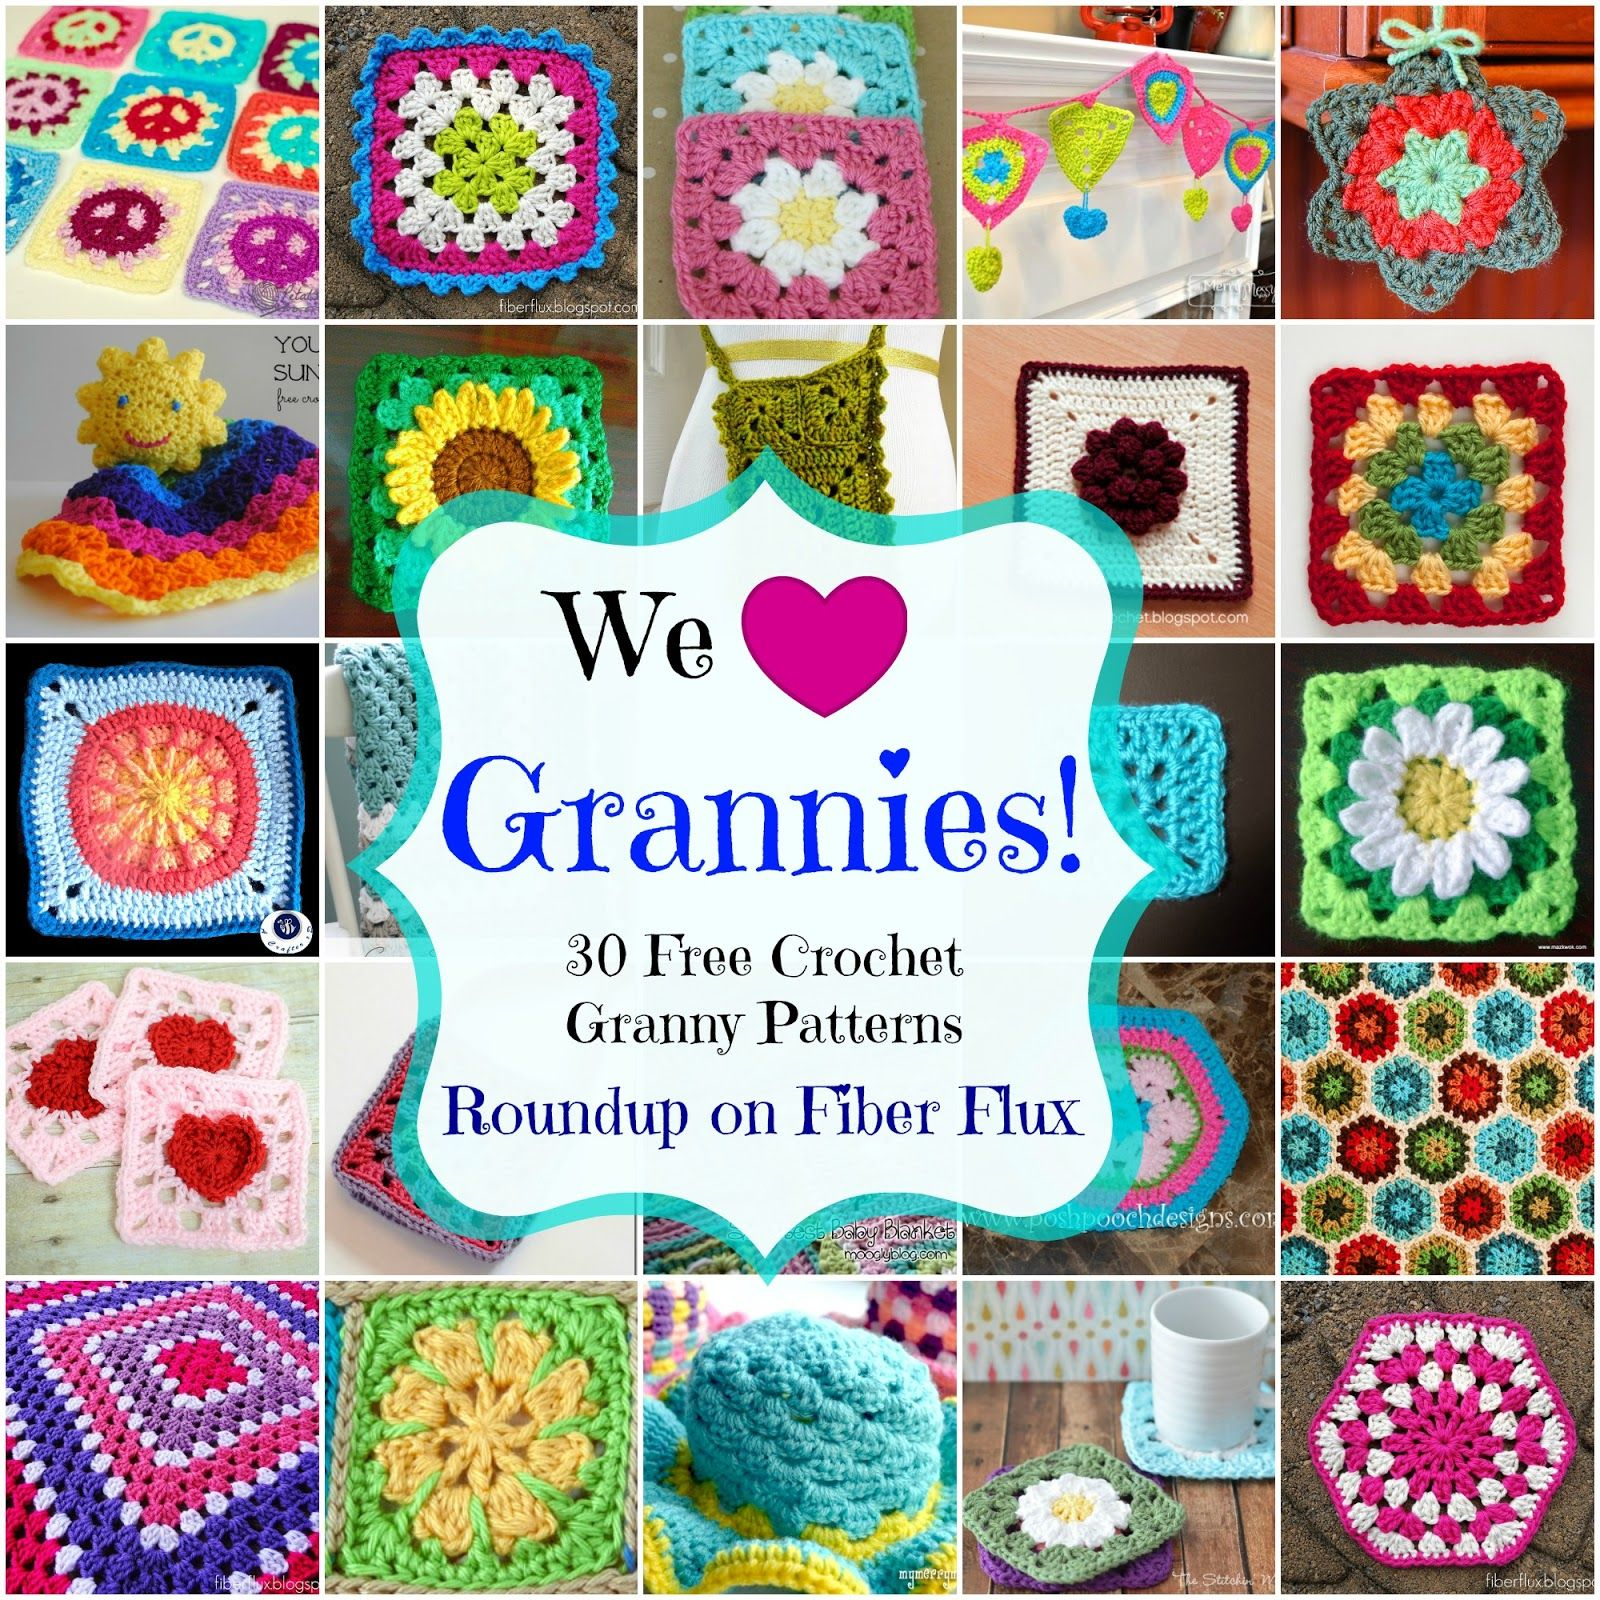 Free grannies